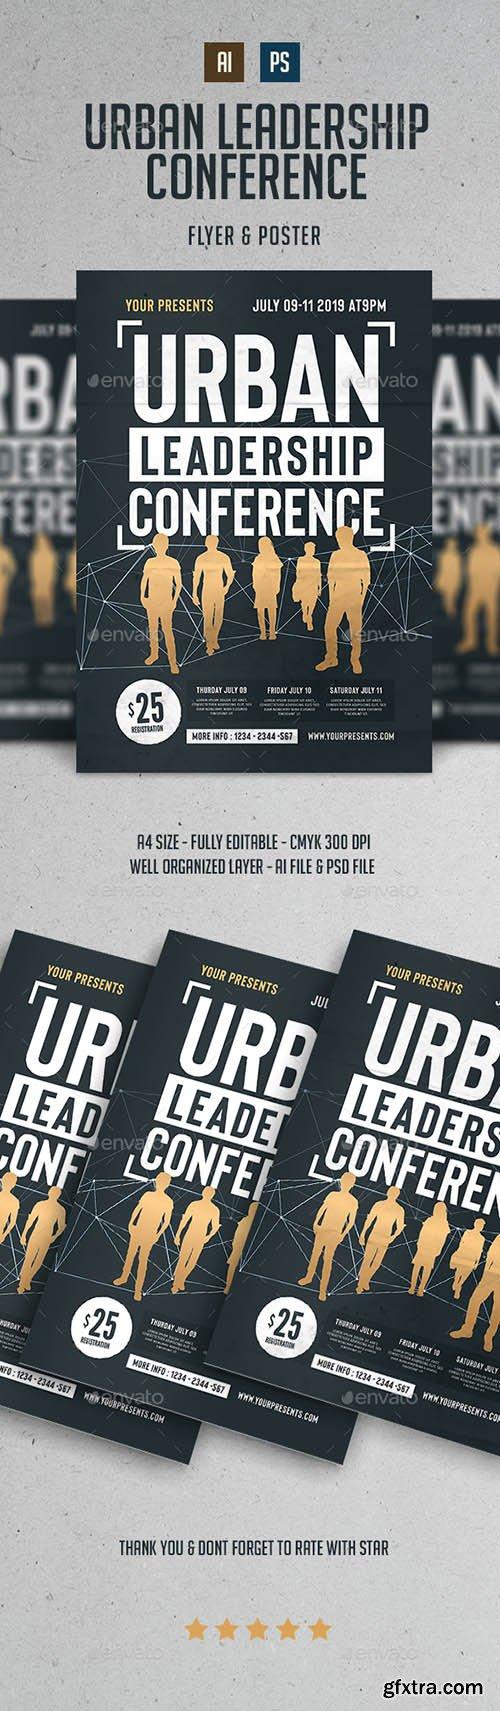 Urban Leadership Conference Flyer 22302542